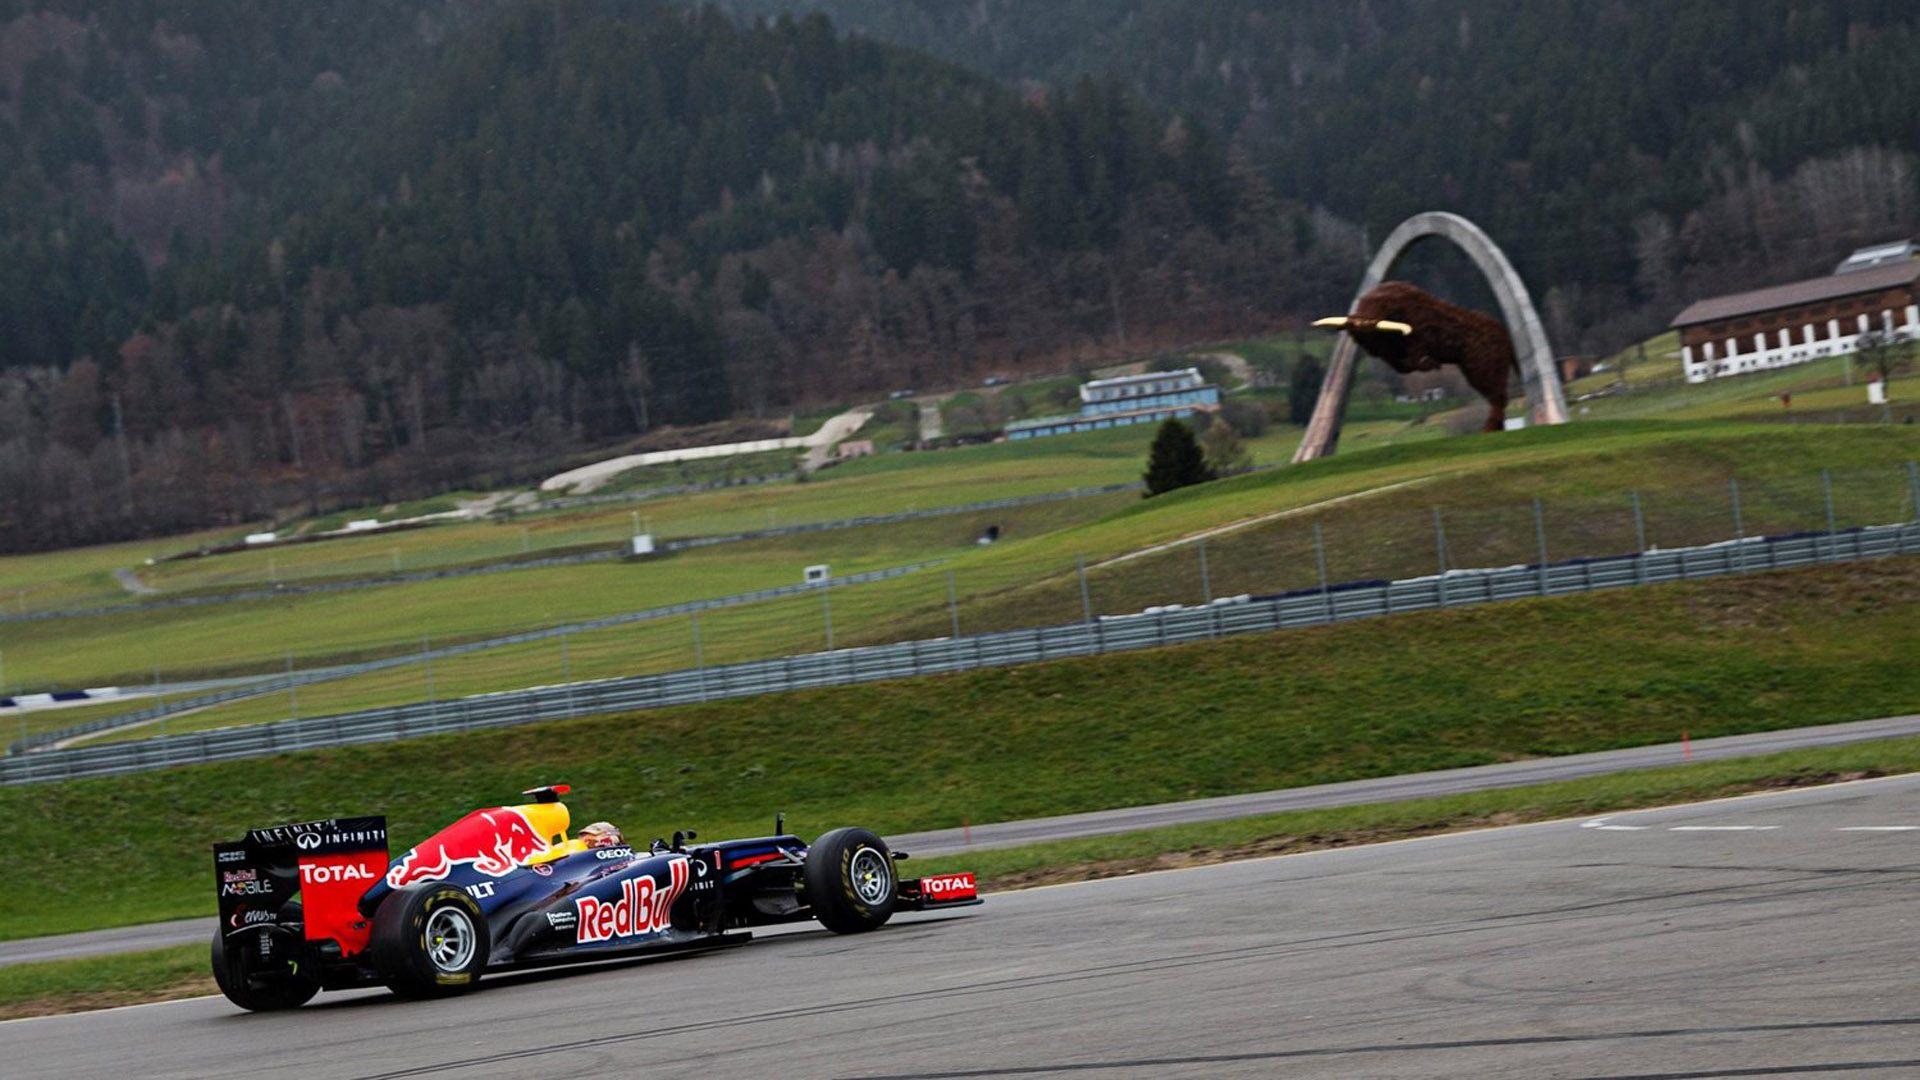 La F1 llega al circuito de Red Bull